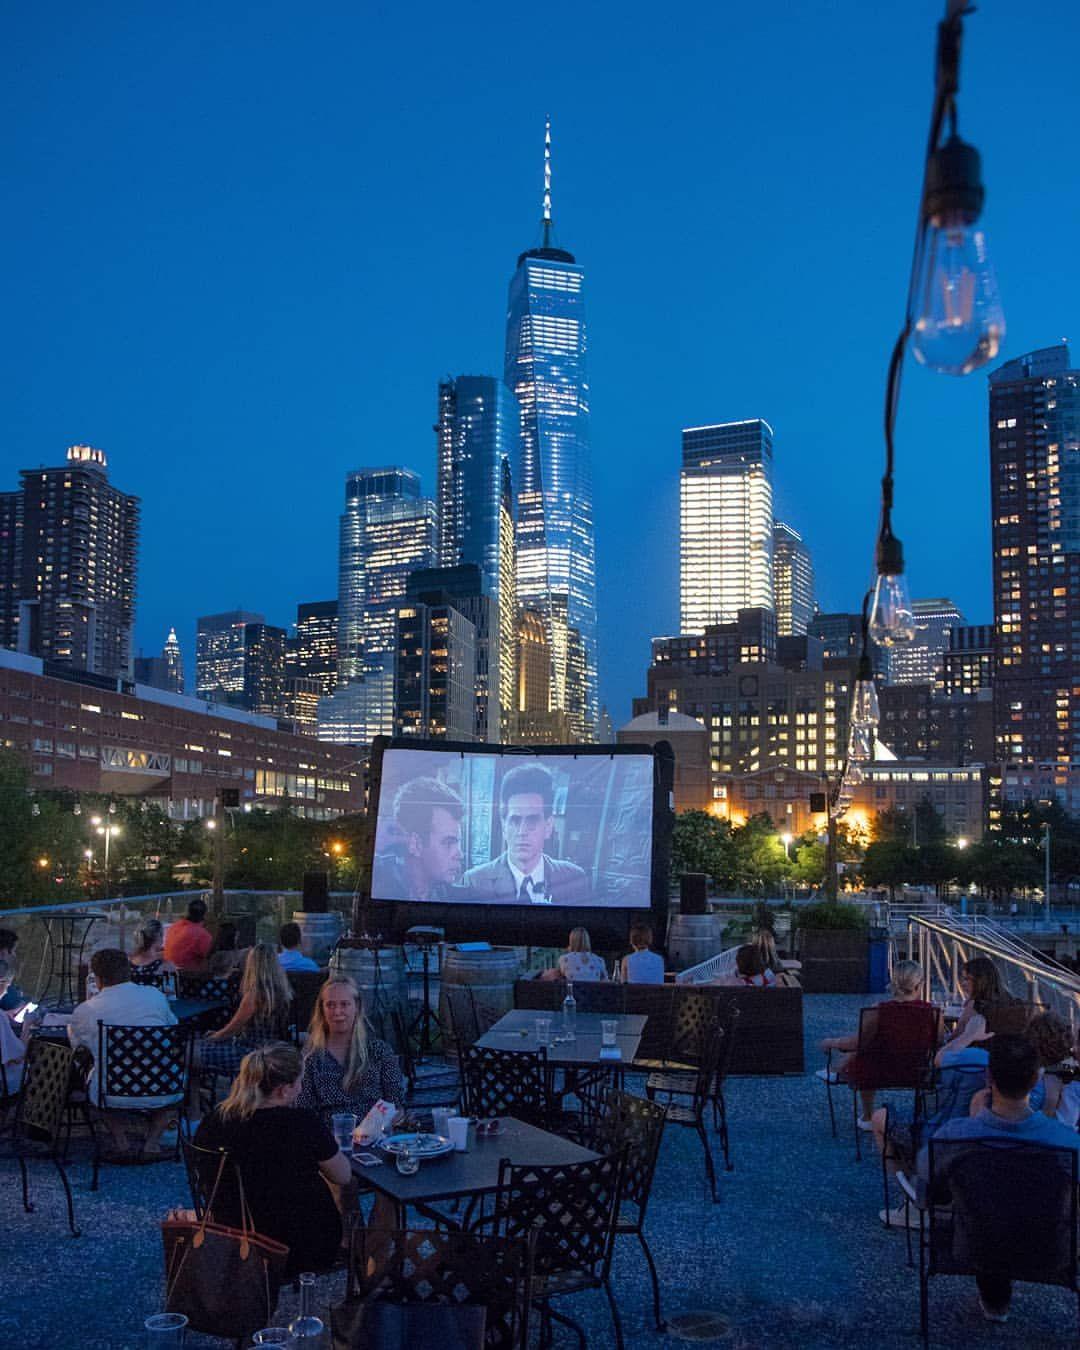 Monday Rooftop Movie Nights At City Vineyard On Pier 26 Lowermanhattan Outdoormovie Ghostbusters Newyor Rooftop Cinema New York Architecture Rooftop